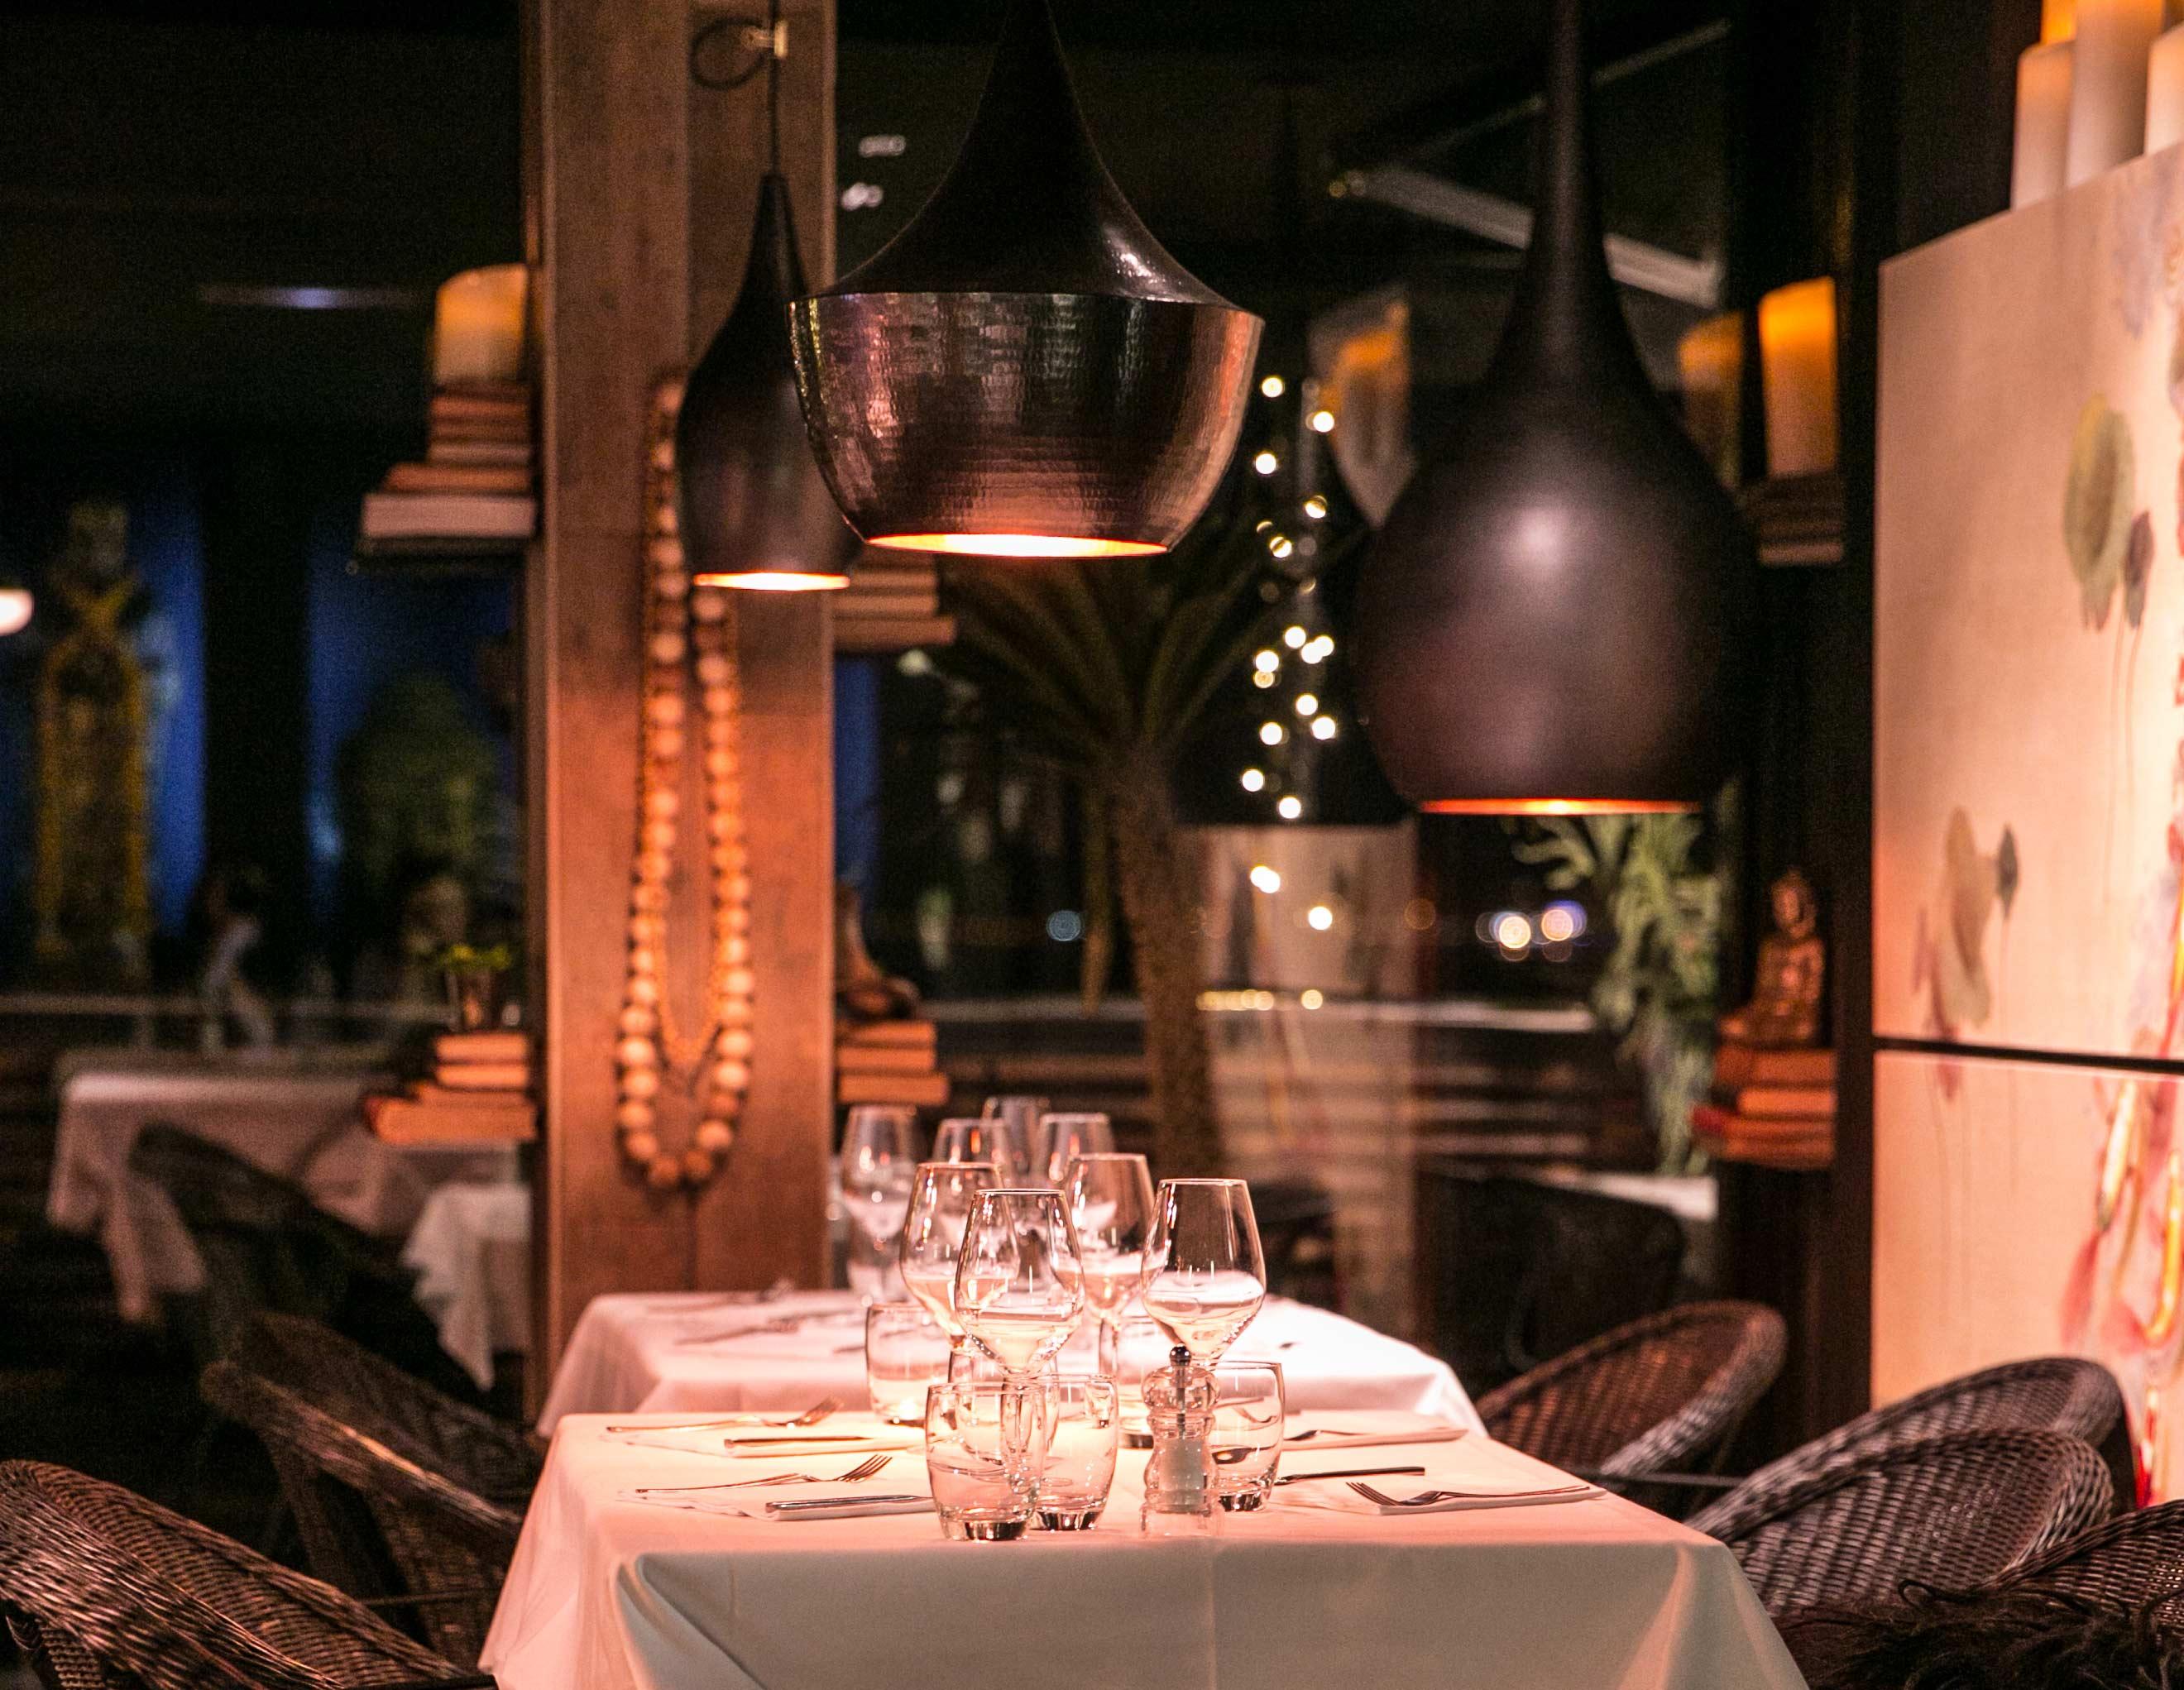 Ambiance Bord De Mer Chic restaurant ambiance asiatique chic - p.kitchen - pointe rouge